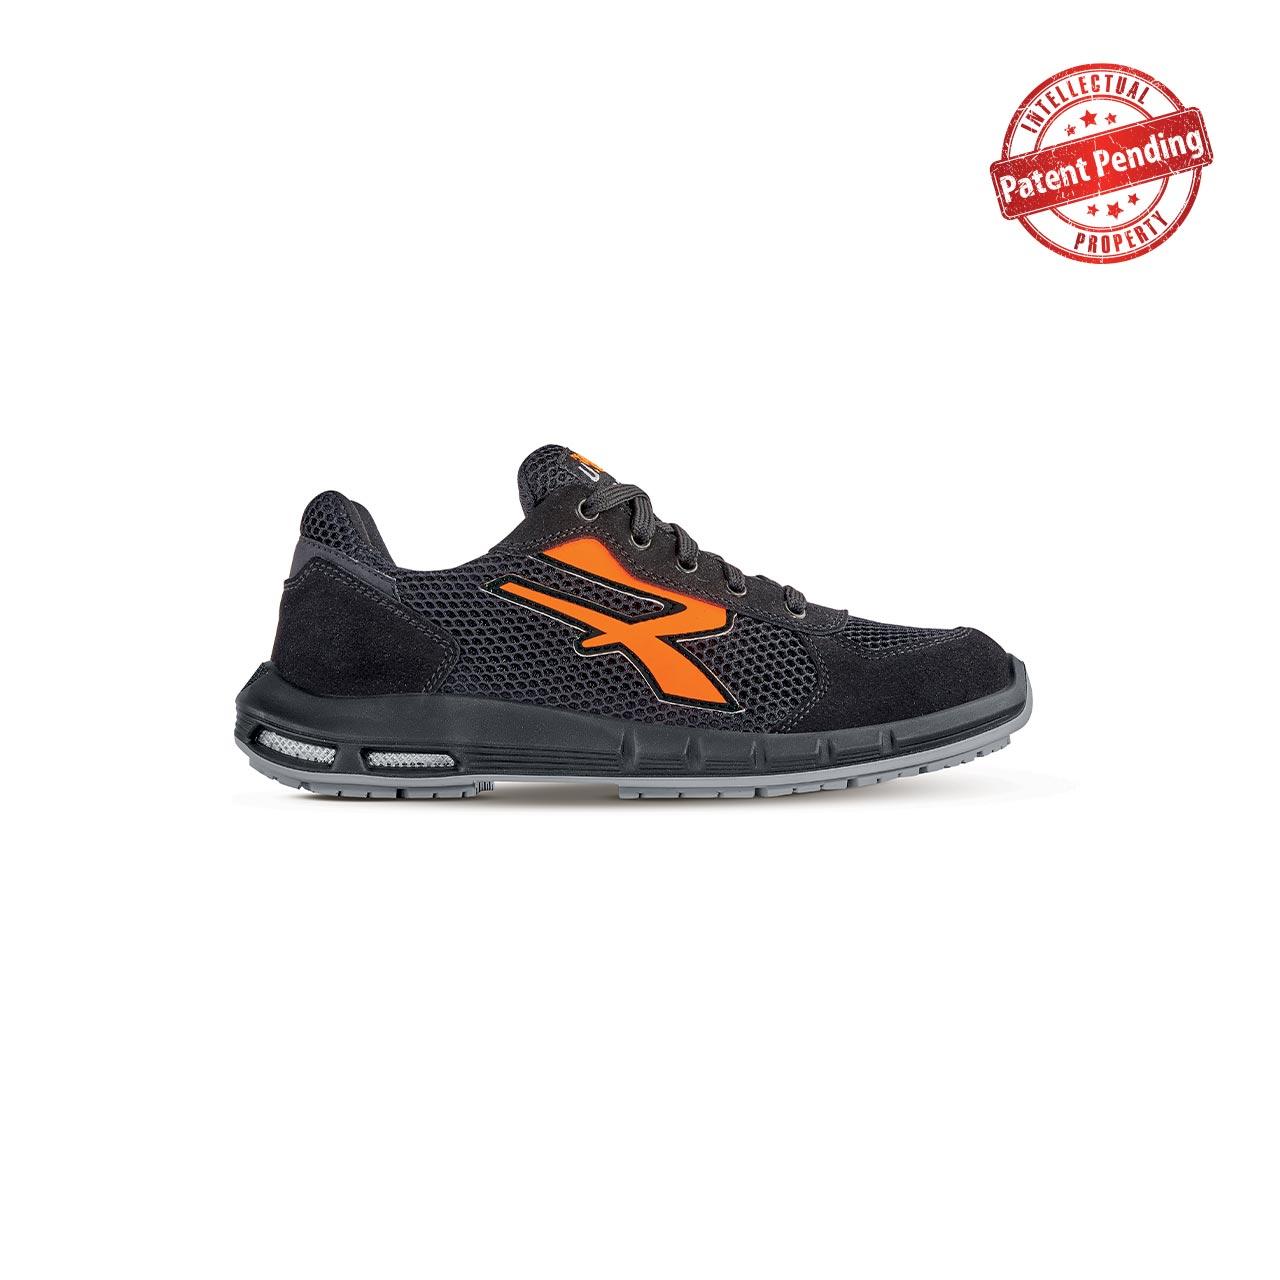 scarpa antinfortunistica upower modello atos plus linea redup plus vista laterale